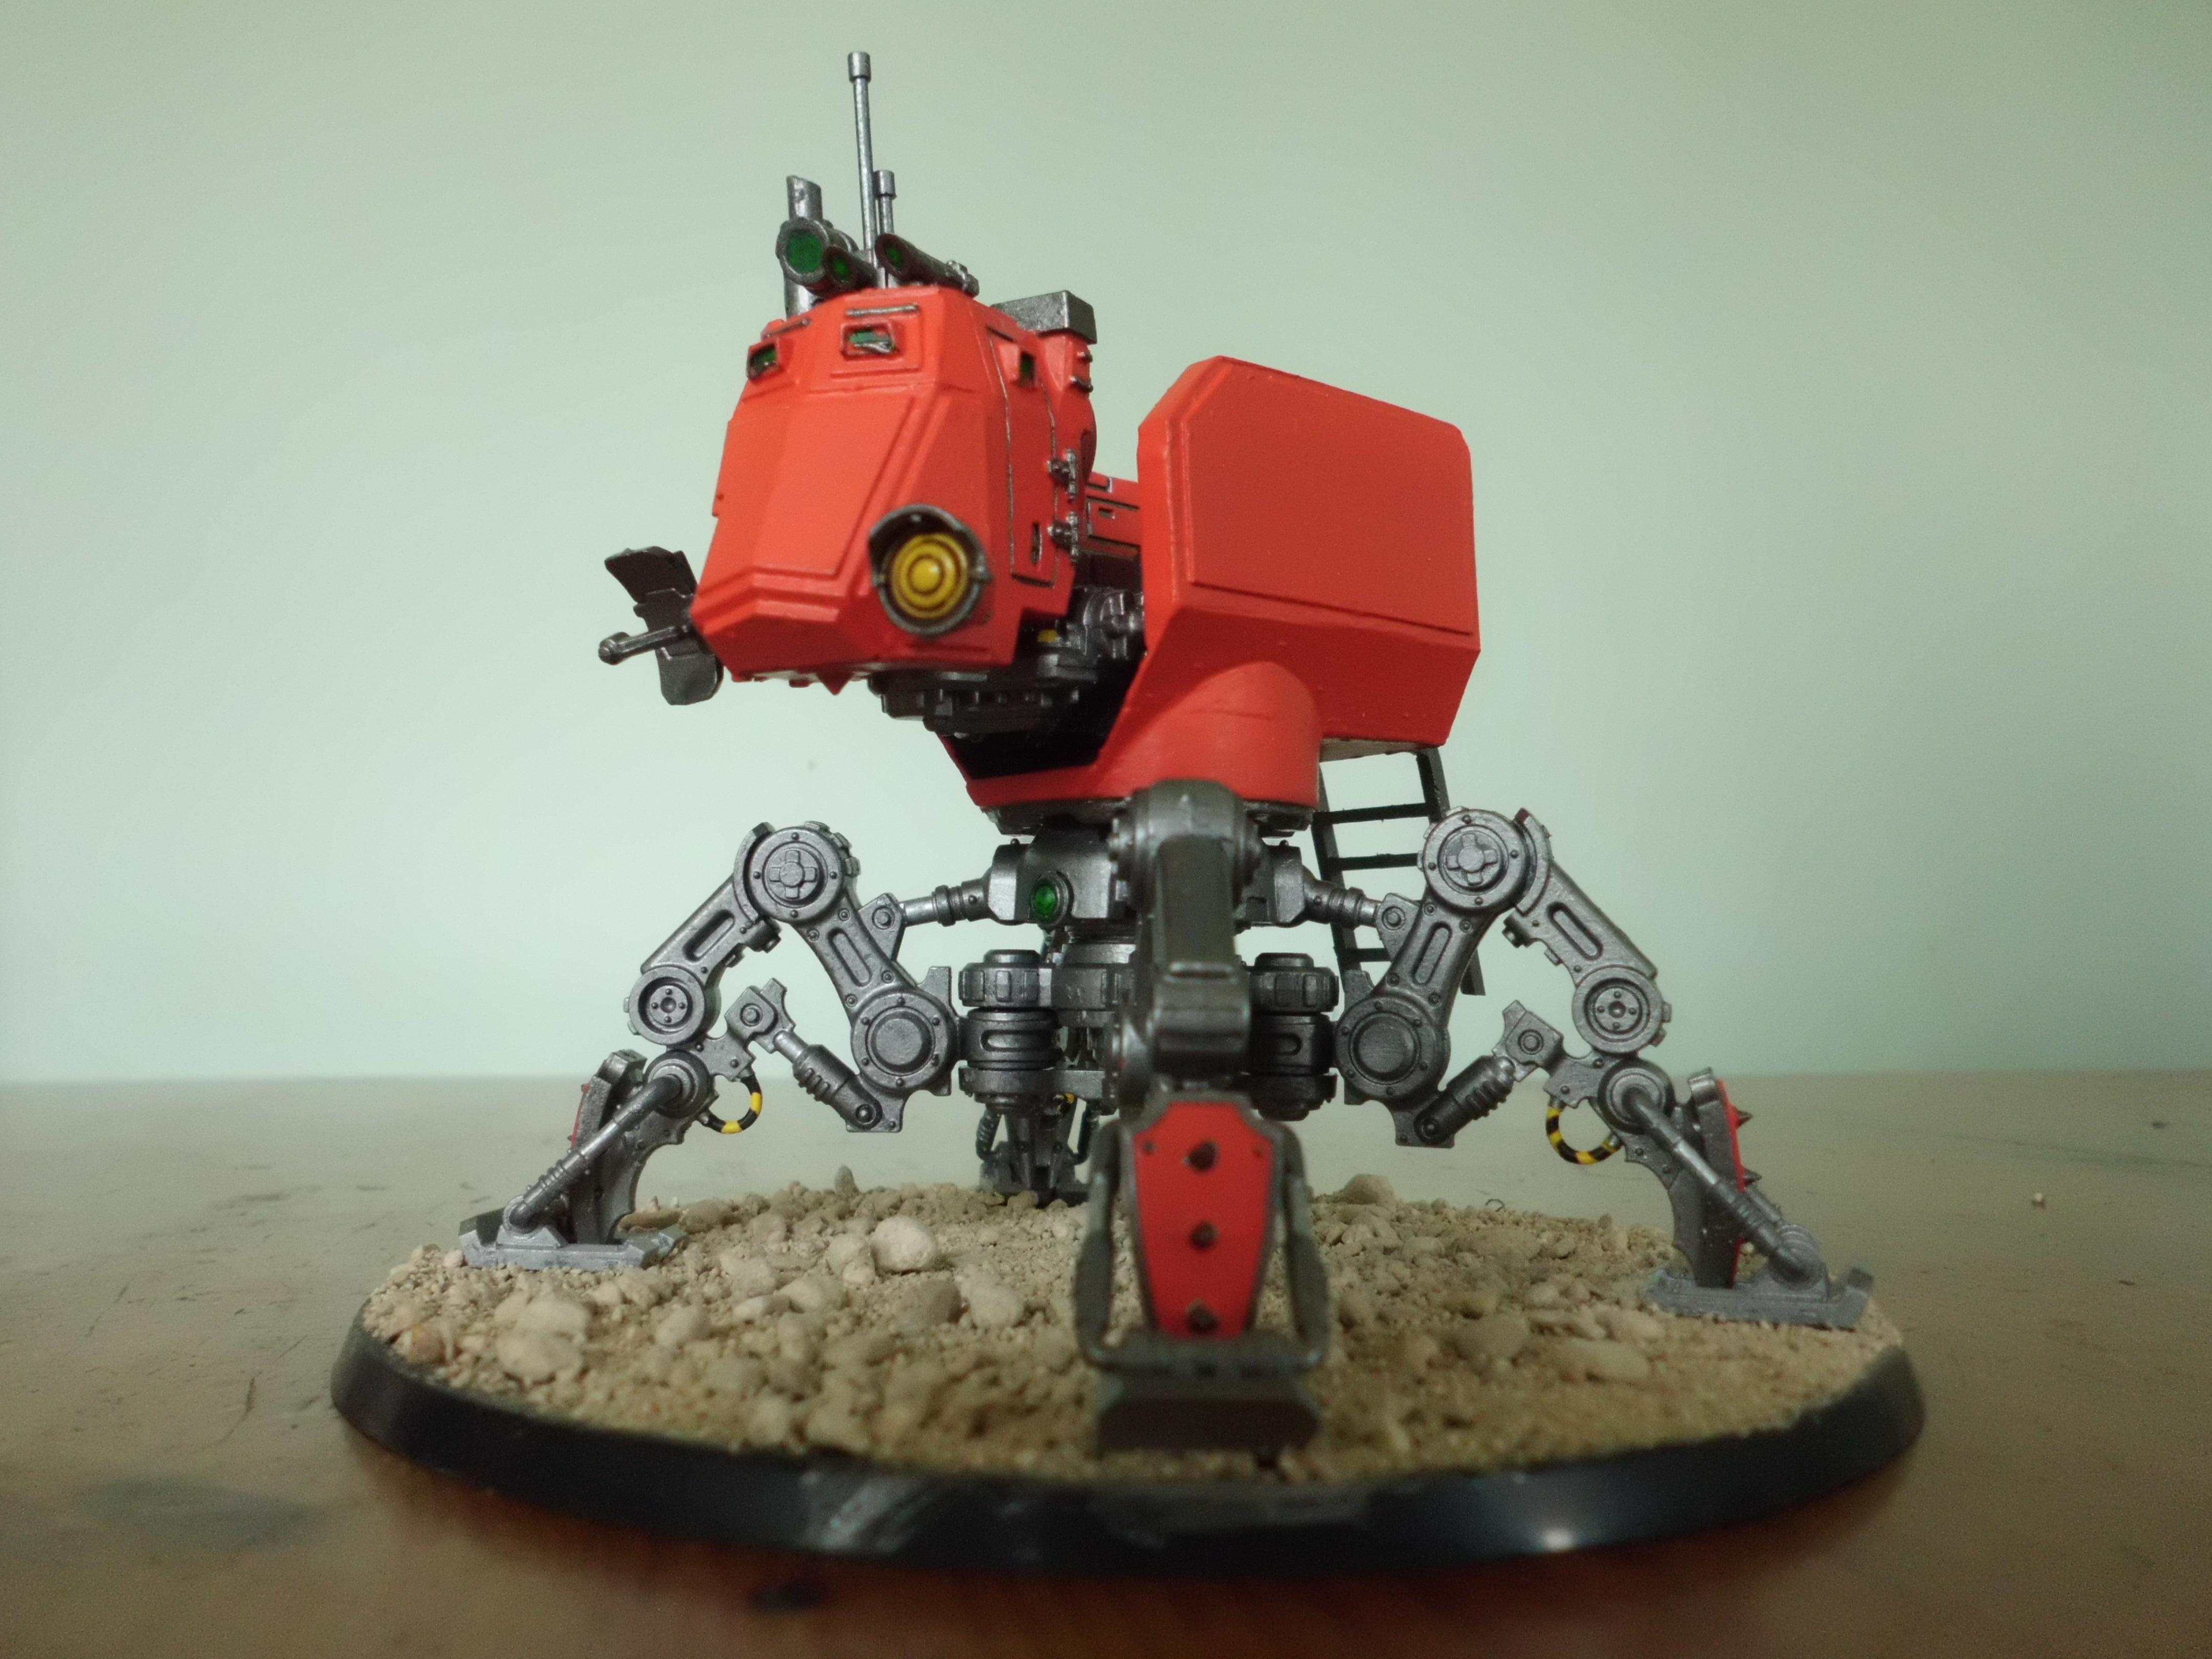 30k, 40k Mule, Conversion, M.u.l.e, Mars Universal Land Engine, Mechanicum, Mule, Onager, Open Topped, Ordo Reductor, Radar, Scatter Laser, Troop Transport, Warhammer 40,000